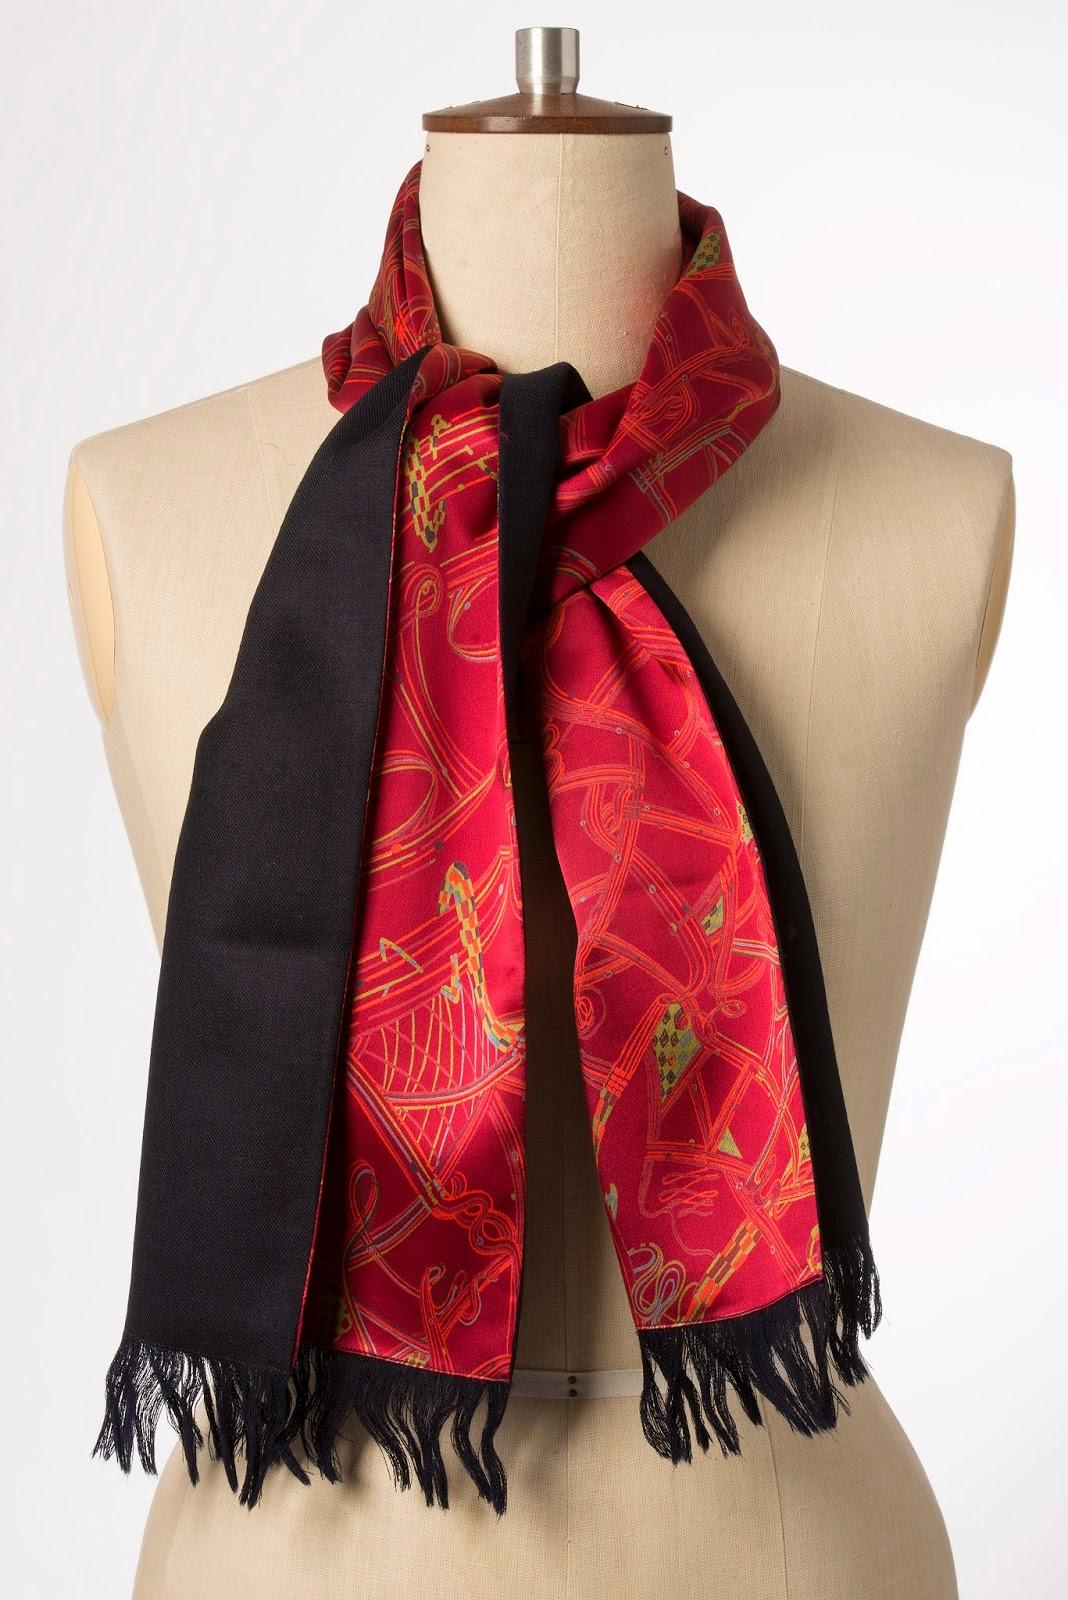 georgina etzdorf new scarves for sale